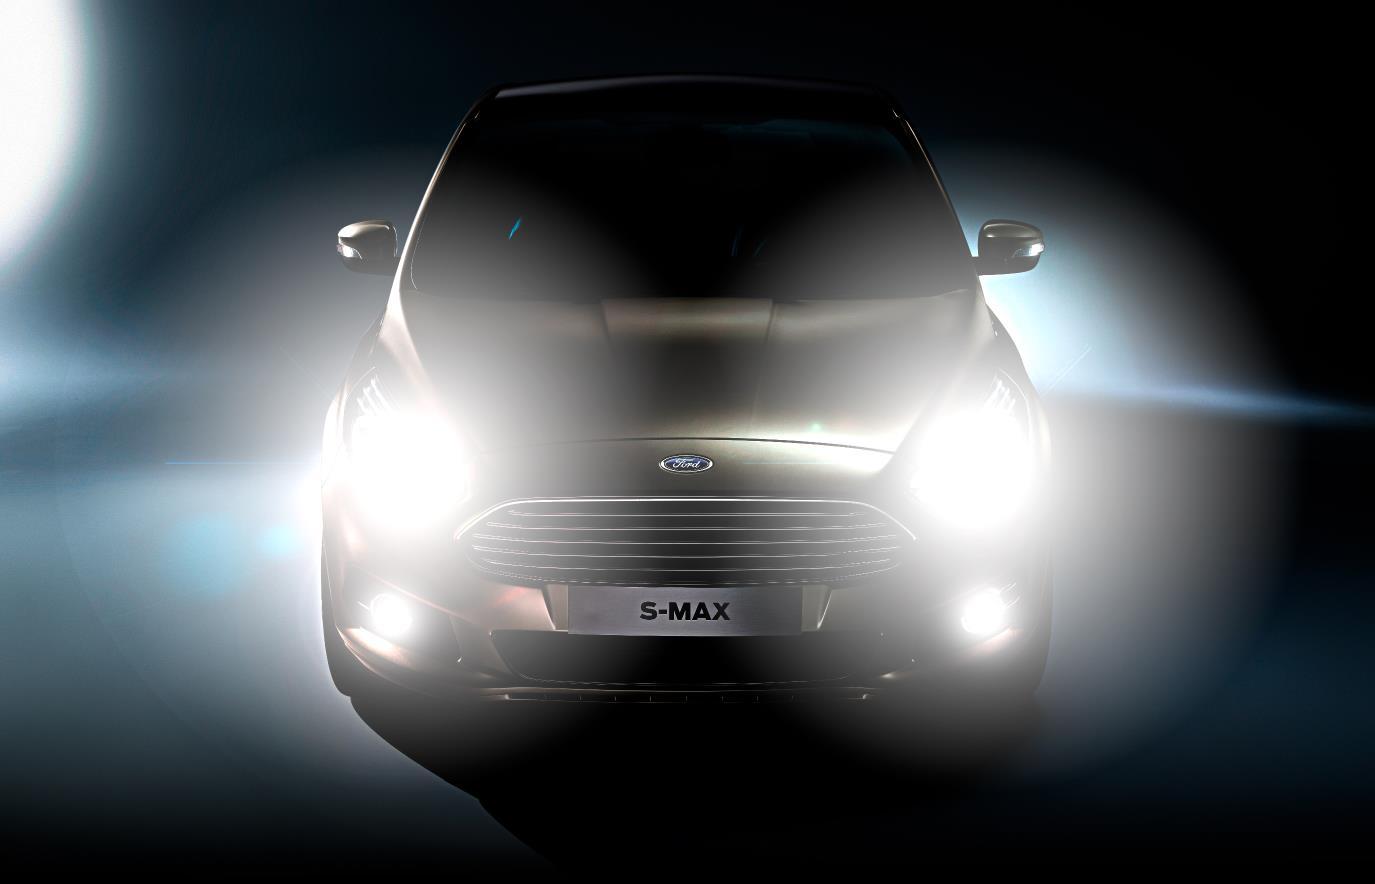 Ford S-MAX Glare-Free High-Beam Headlights